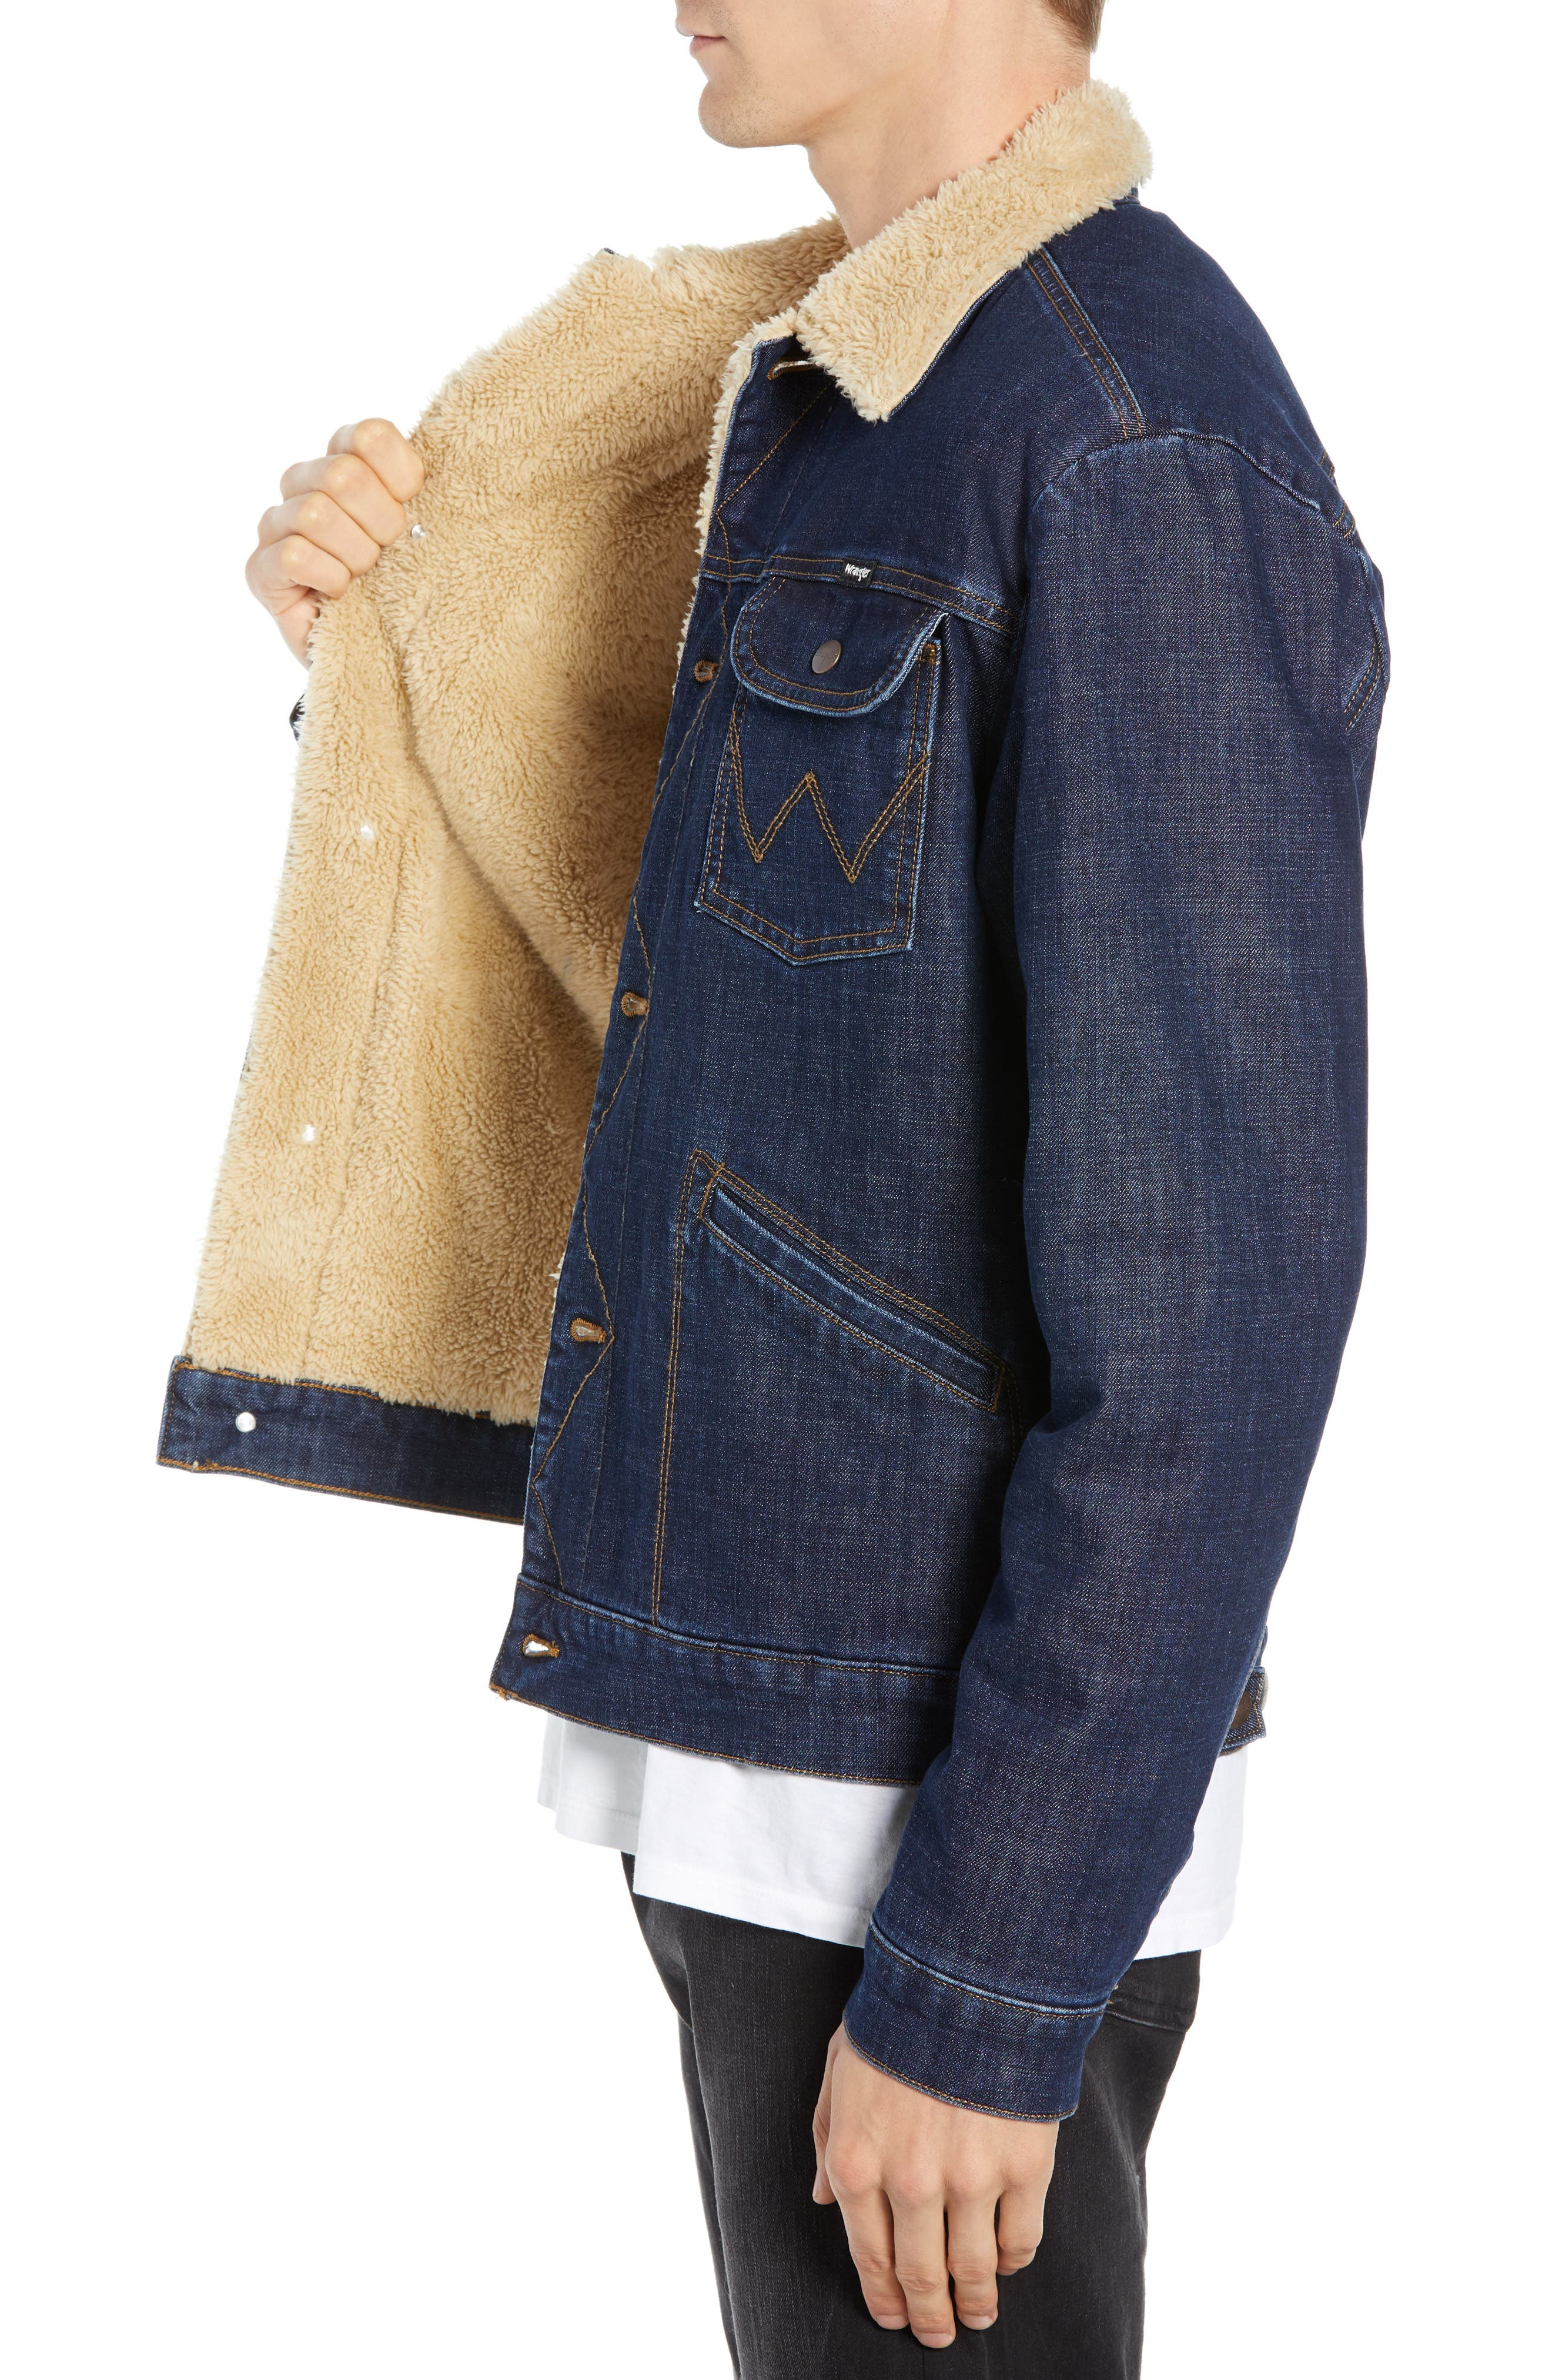 WRANGLER, Heritage Fleece Lined Denim Jacket, Alternate thumbnail 4, color, 472